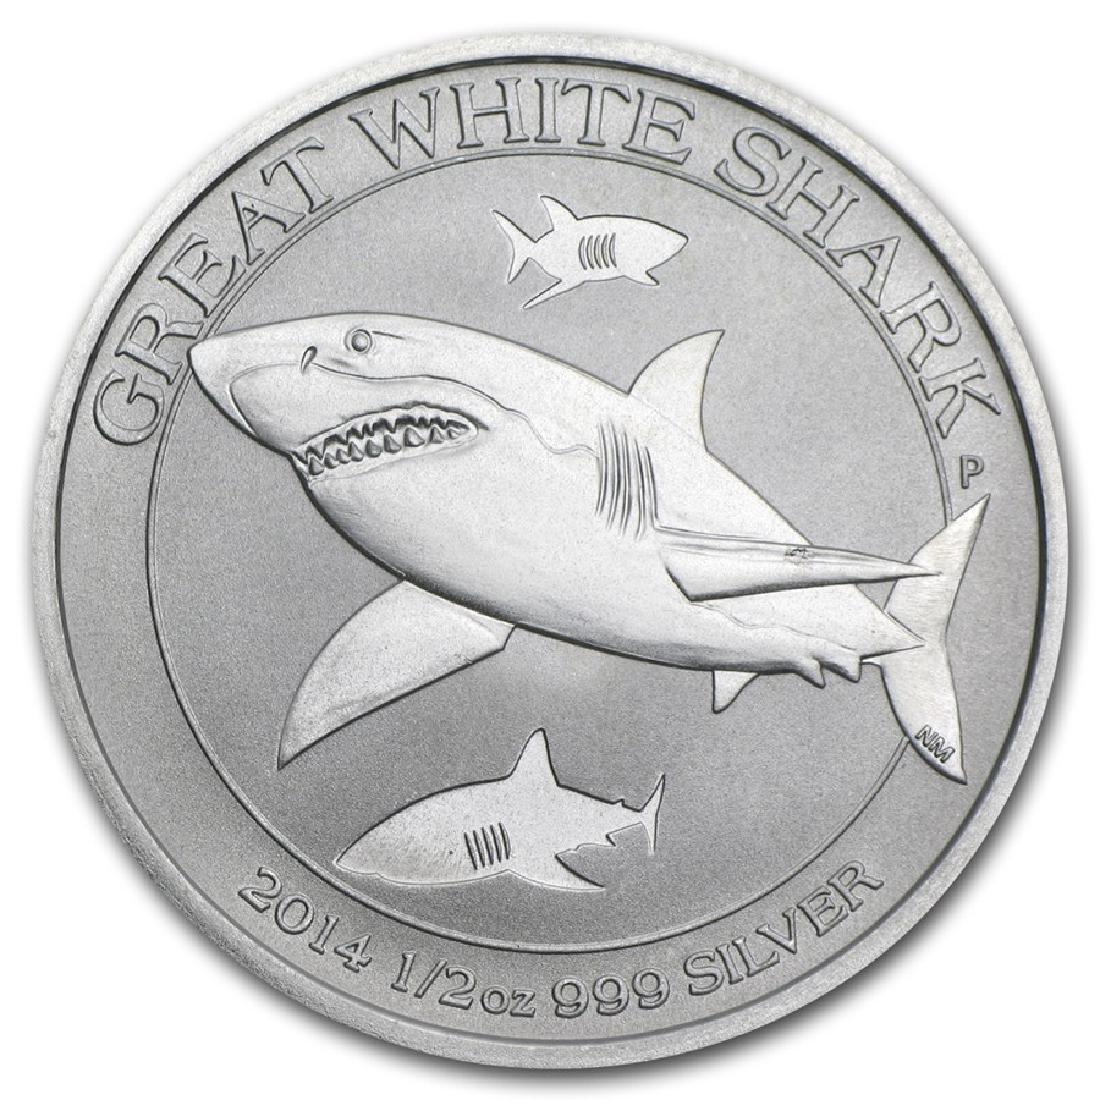 2014 Australia Great White Shark 1/2 oz Silver Coin